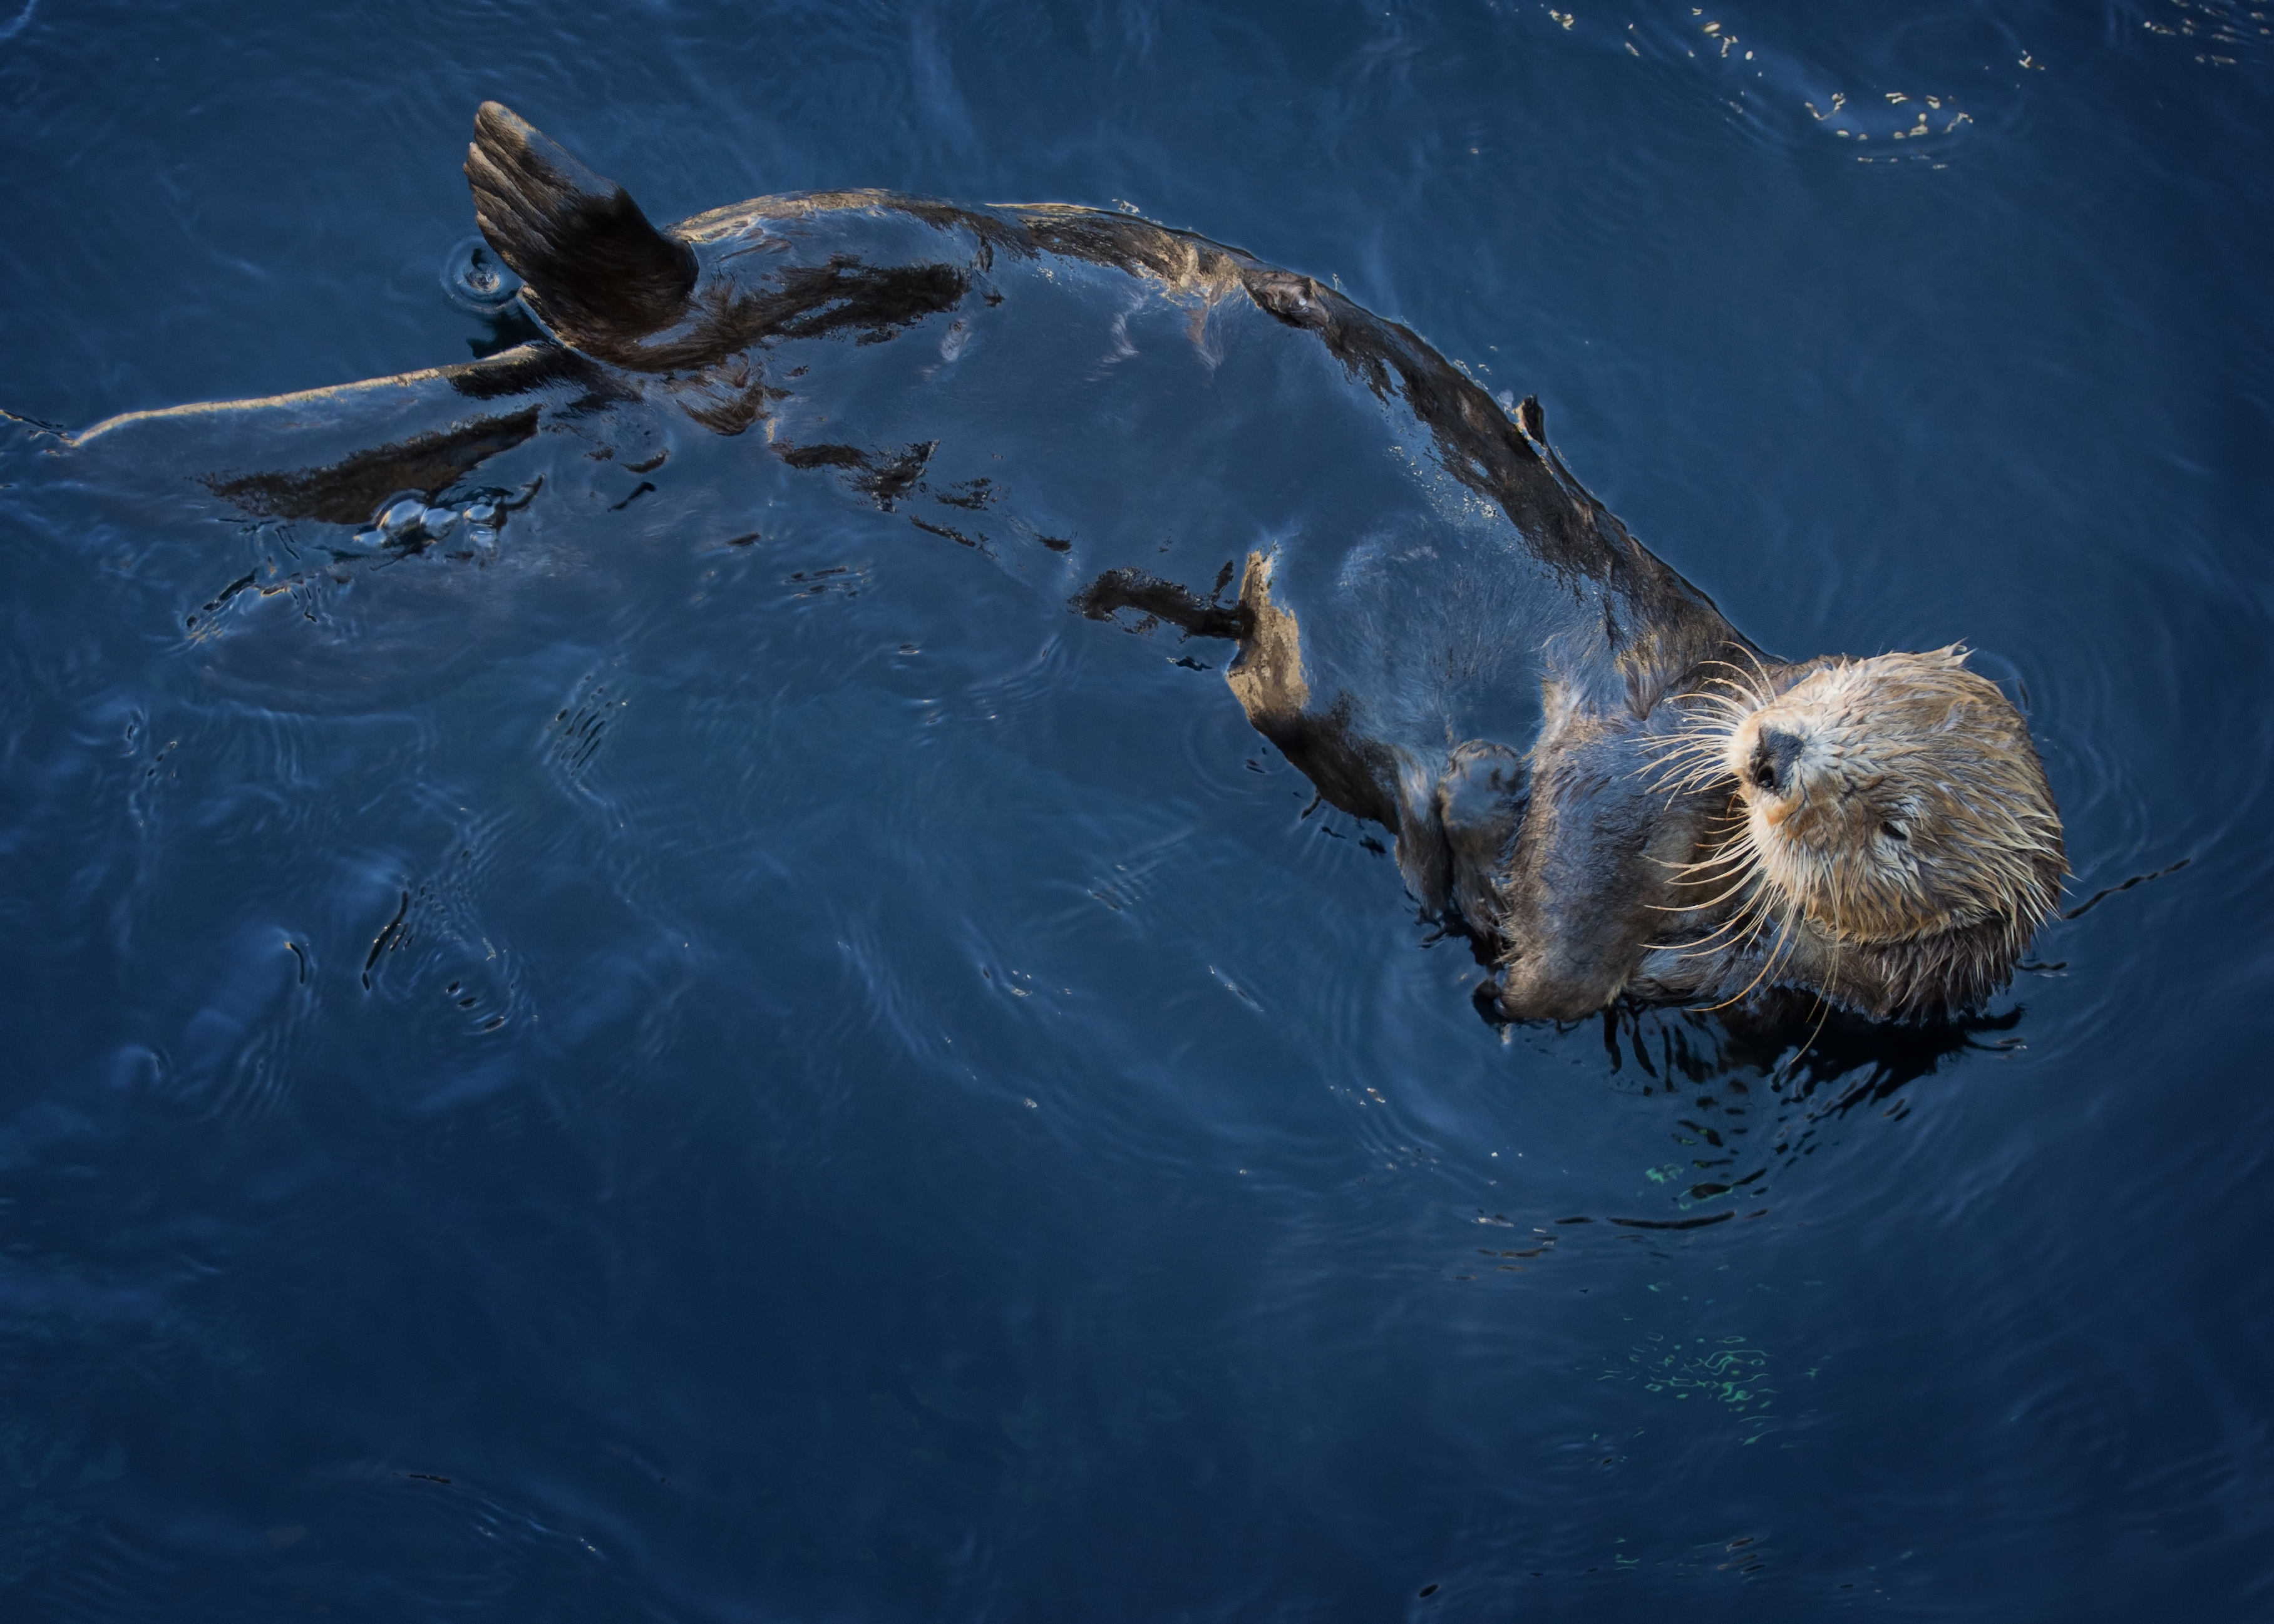 Otter Glide